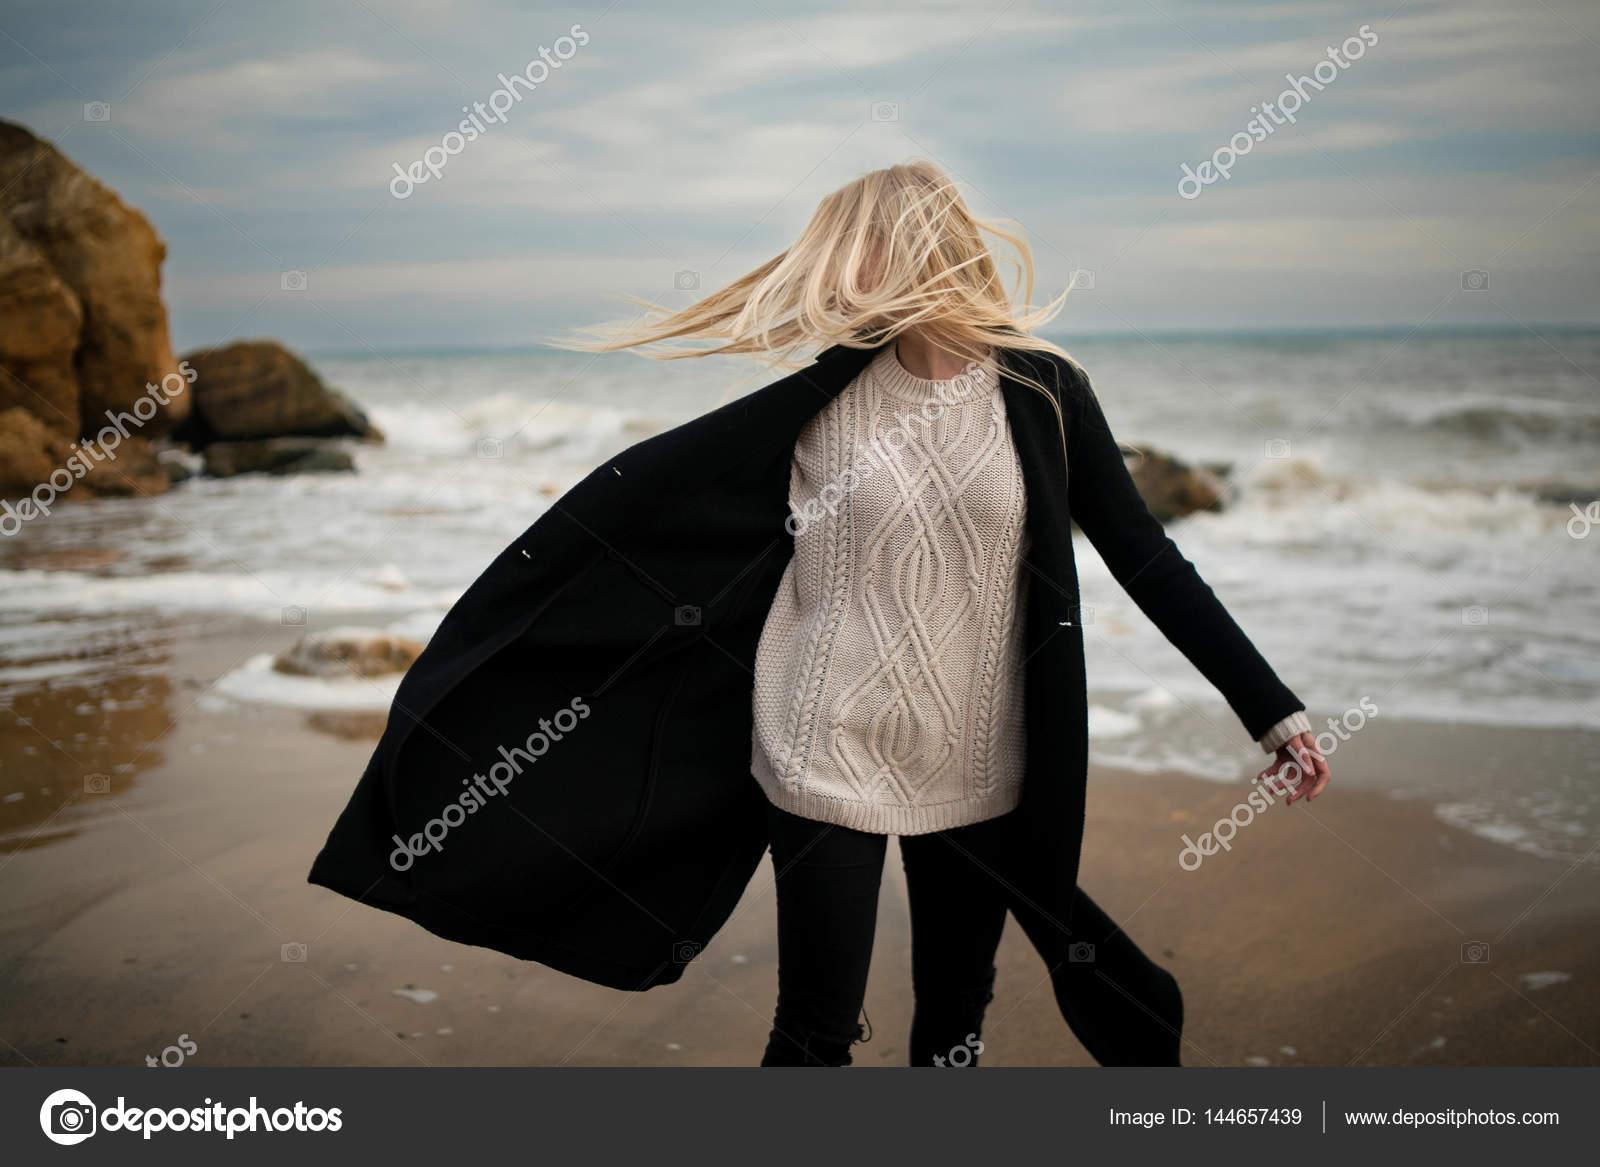 b00e11d04713 Γυναίκα πουλόβερ και παλτό χειμώνα παραλία στον άνεμο. Άνεμος φυσάει τα  μαλλιά και το παλτό — Εικόνα από ...